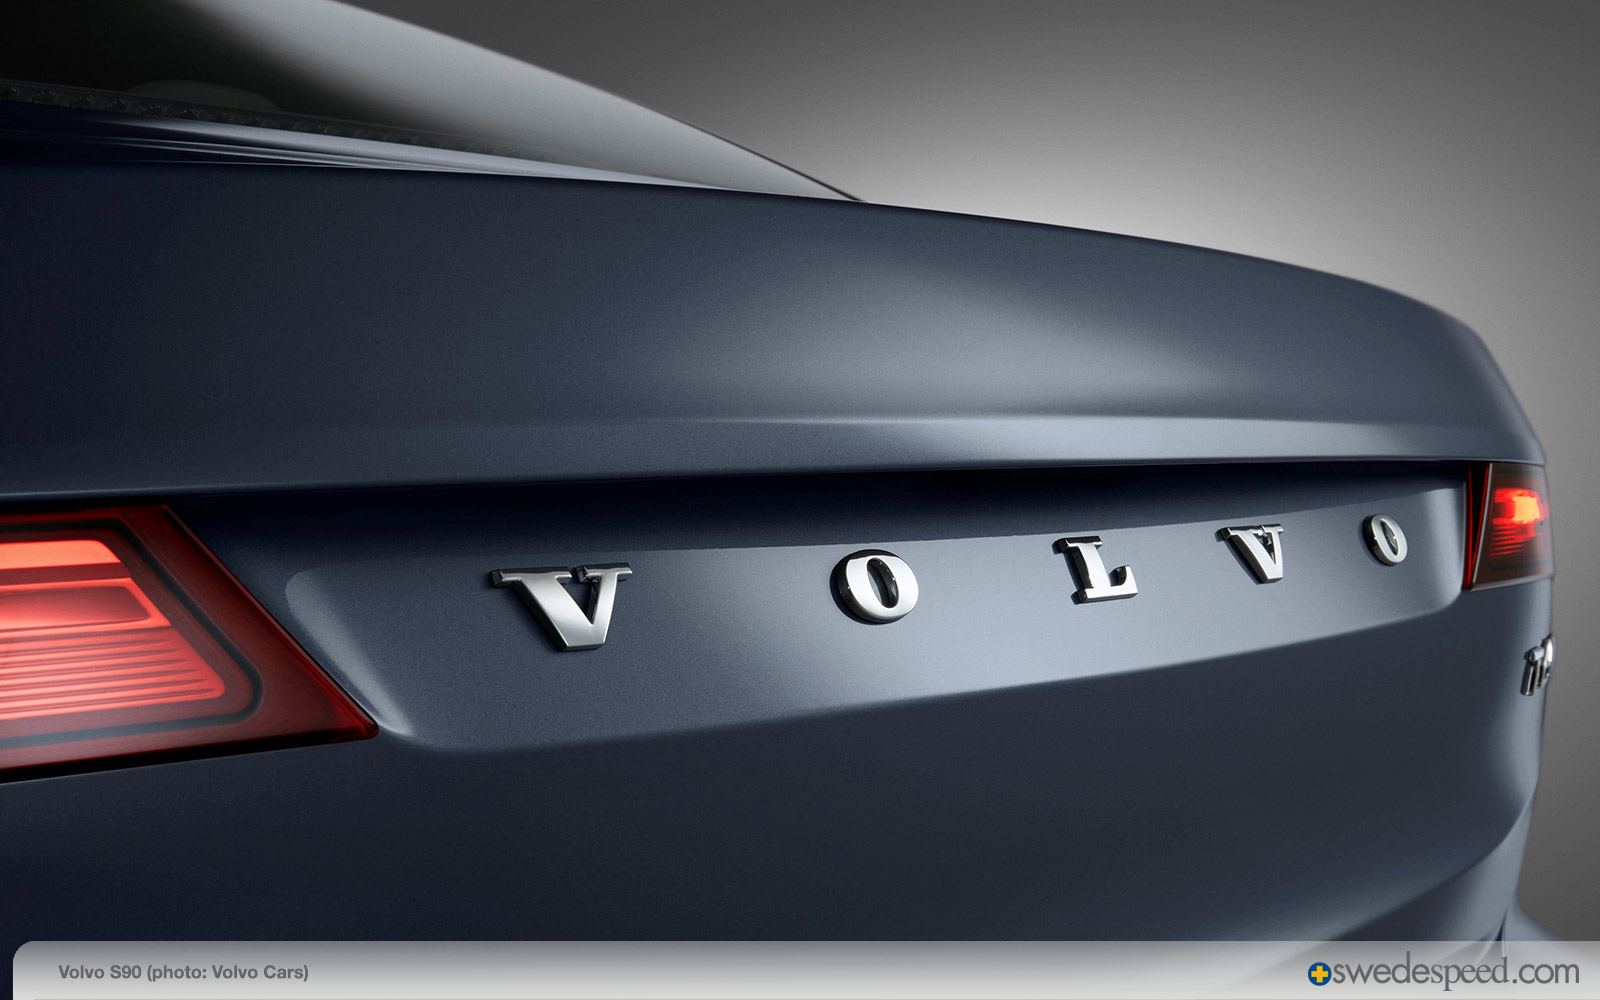 171037_Rear_Volvo_Word_mark_Volvo_S90_Mussel_Blue